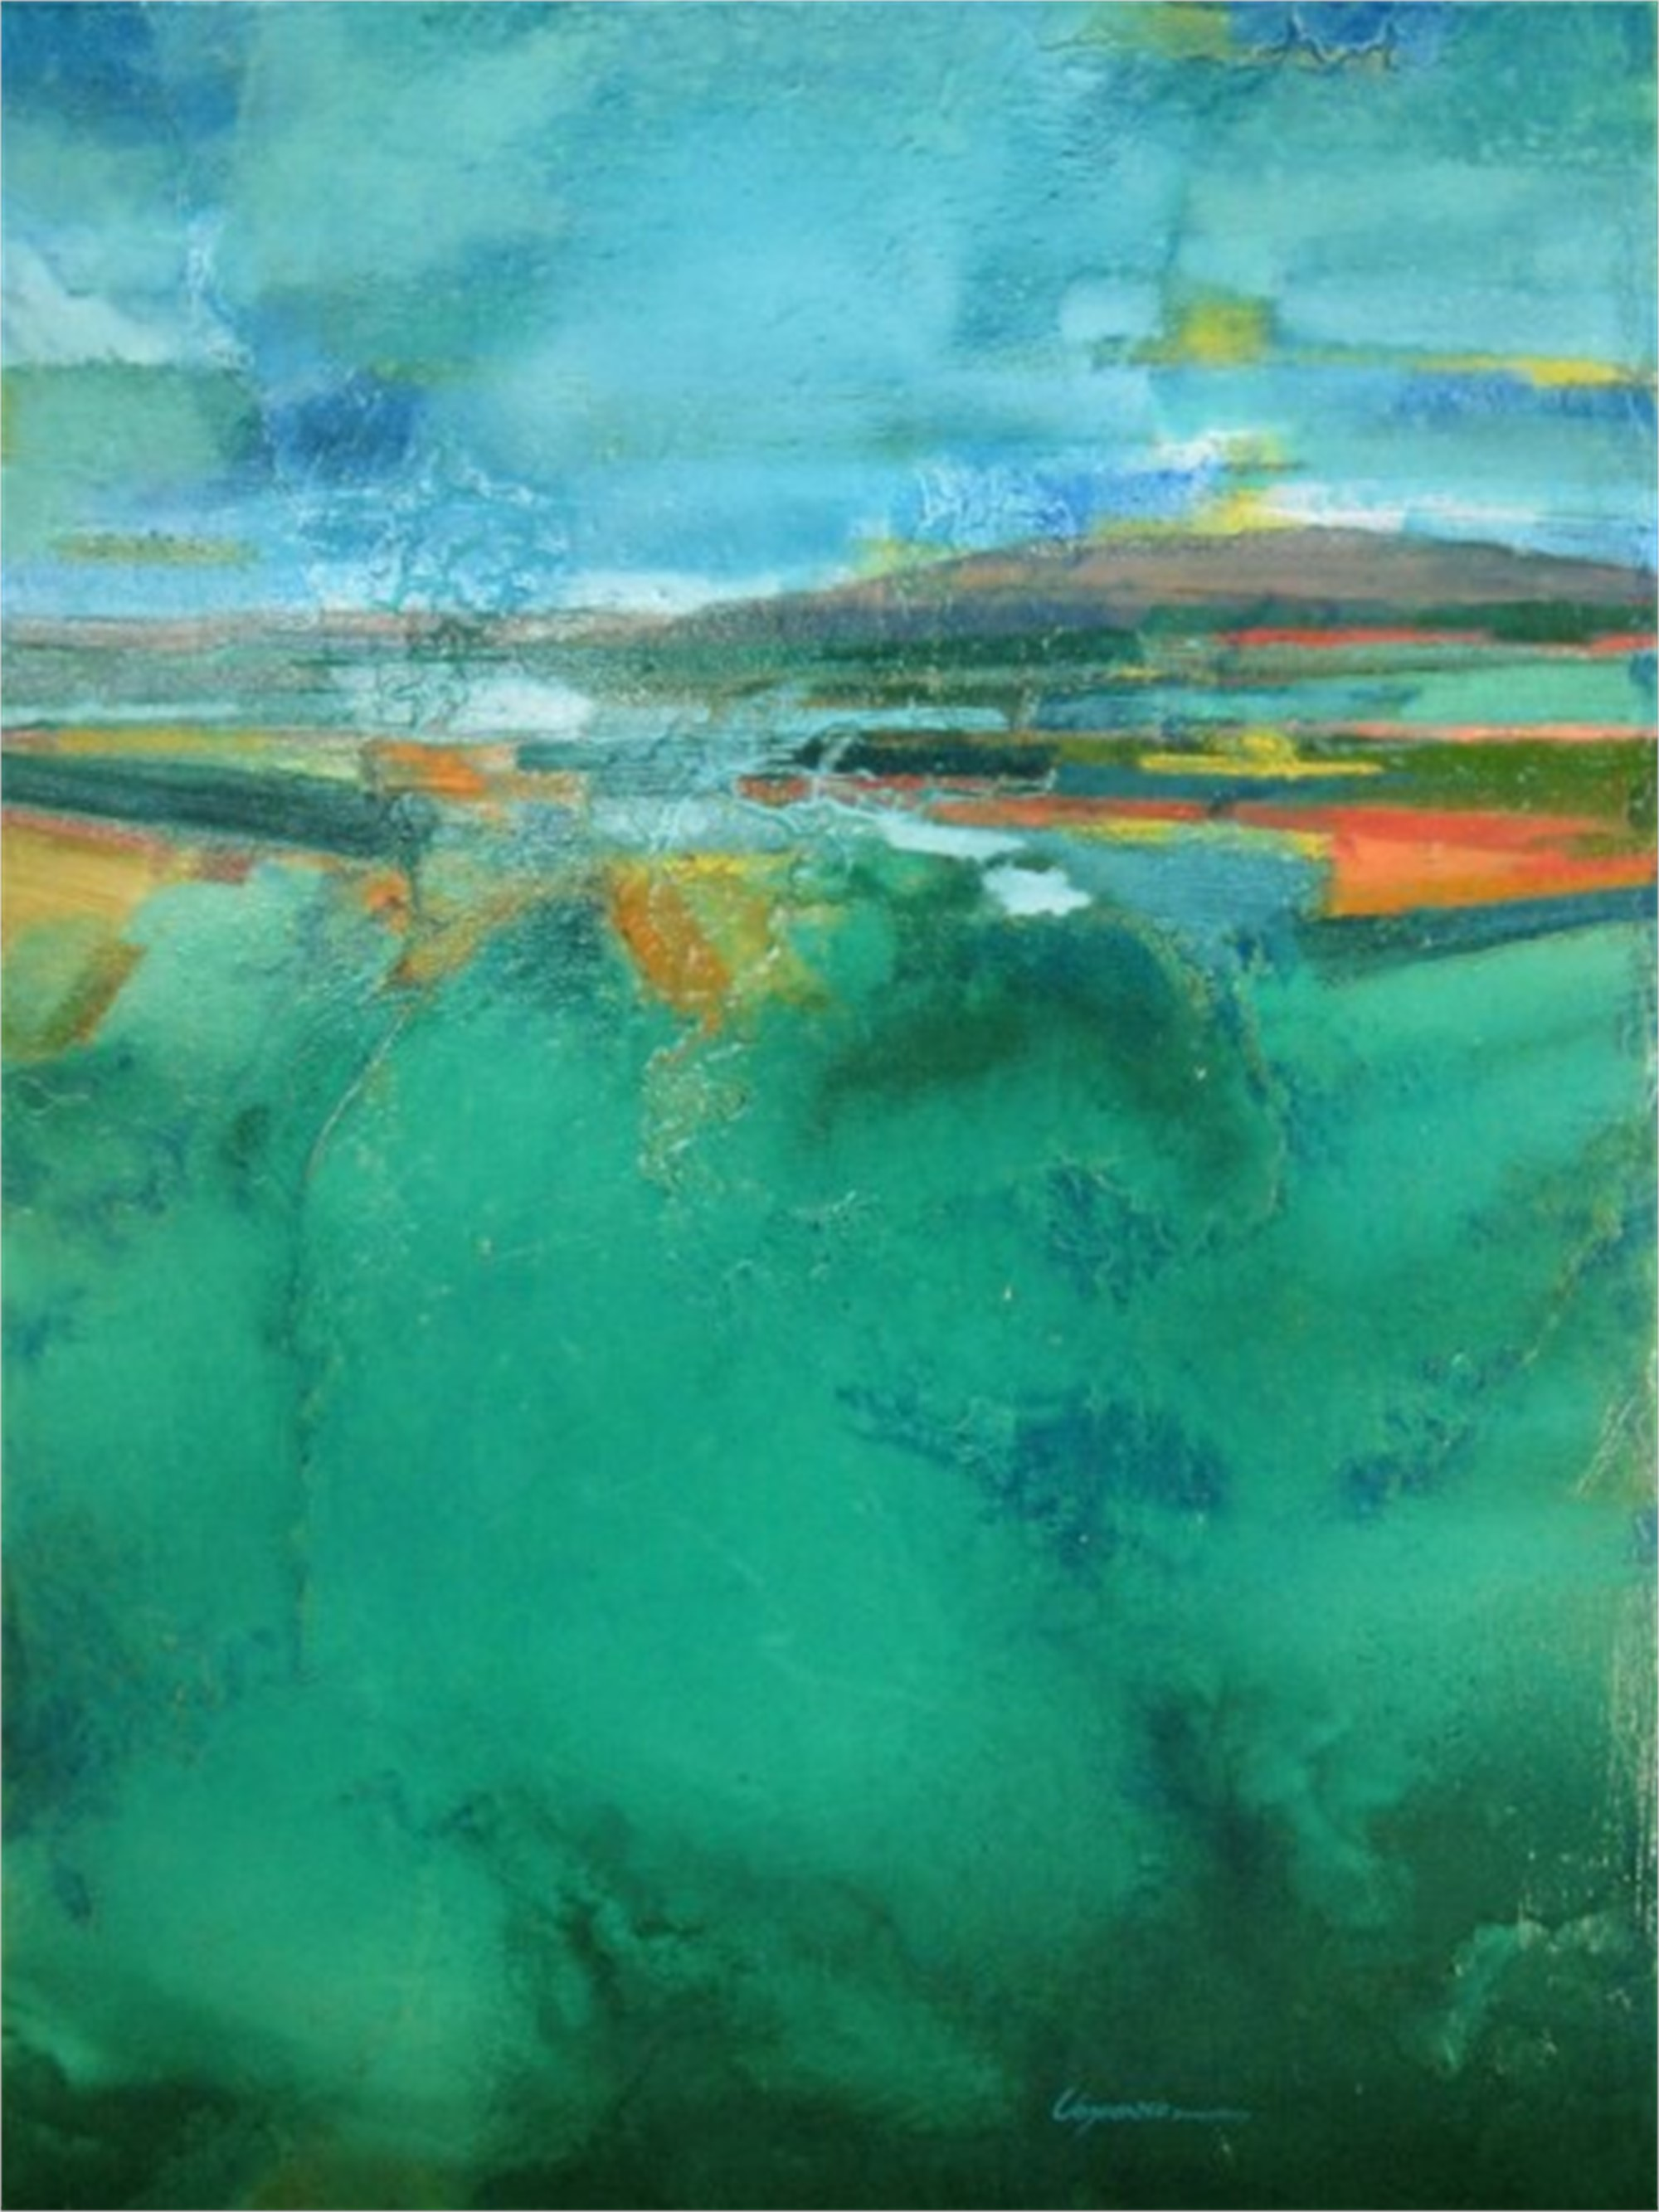 Emerald Valley by Bob Chrzanowski